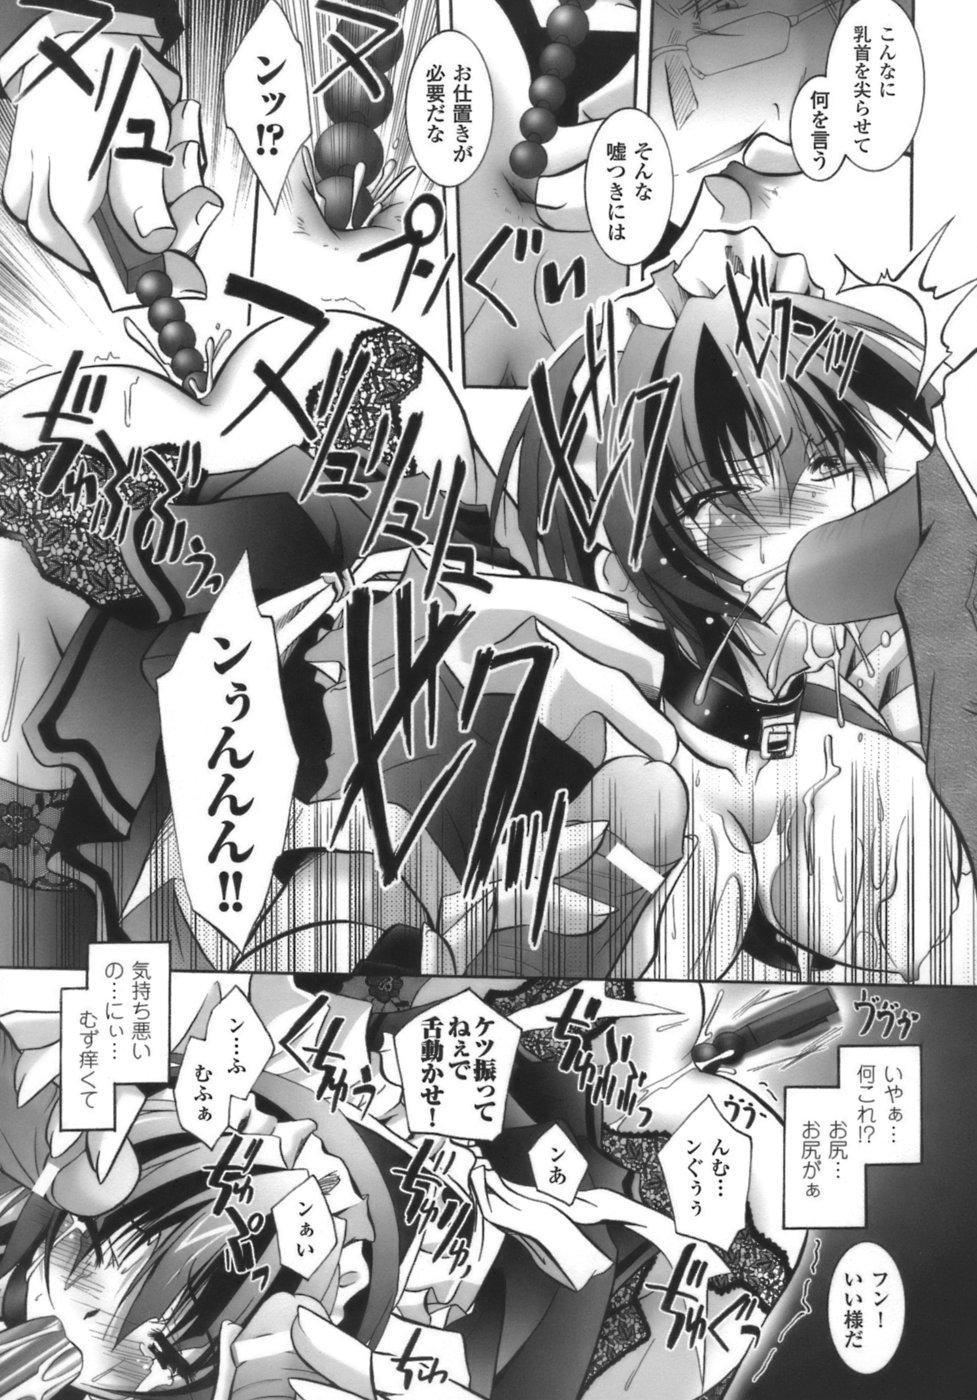 [Parfait] Datenshi-tachi no Chinkonka - Fallen Angels Requiem 101